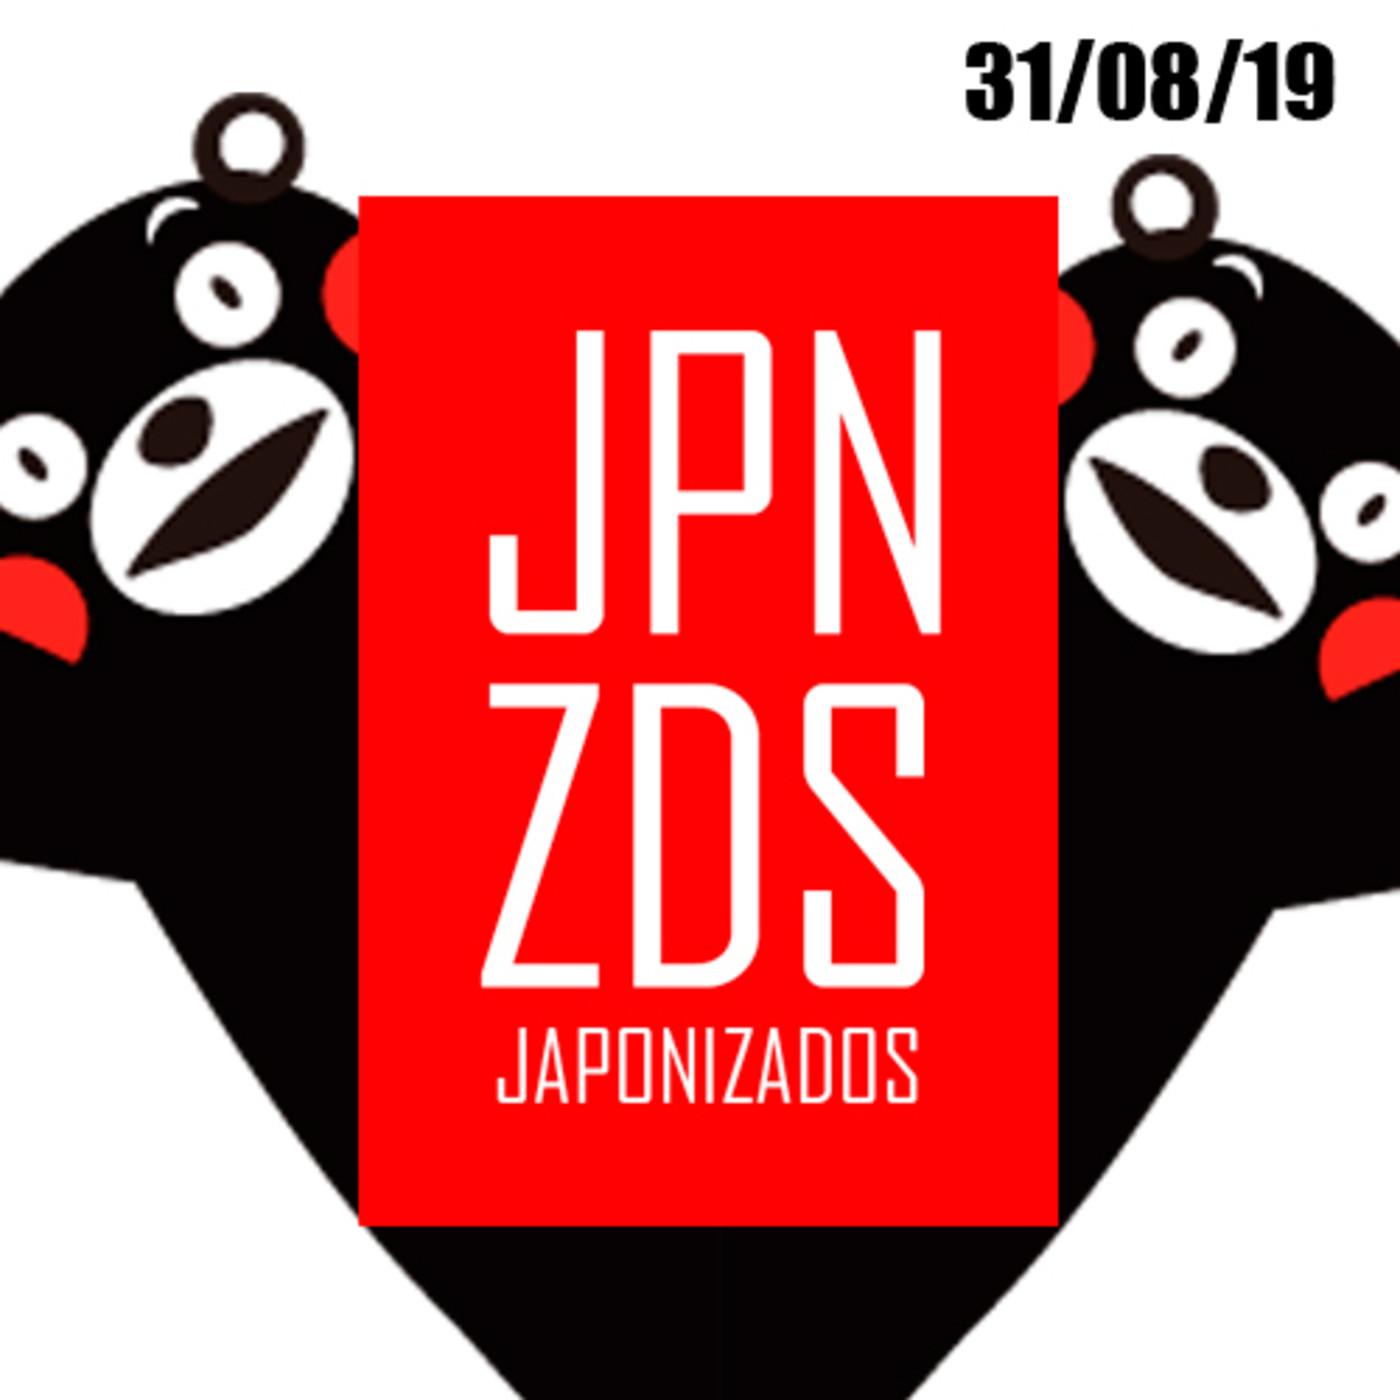 Japonizados Micropodcast Agosto'19